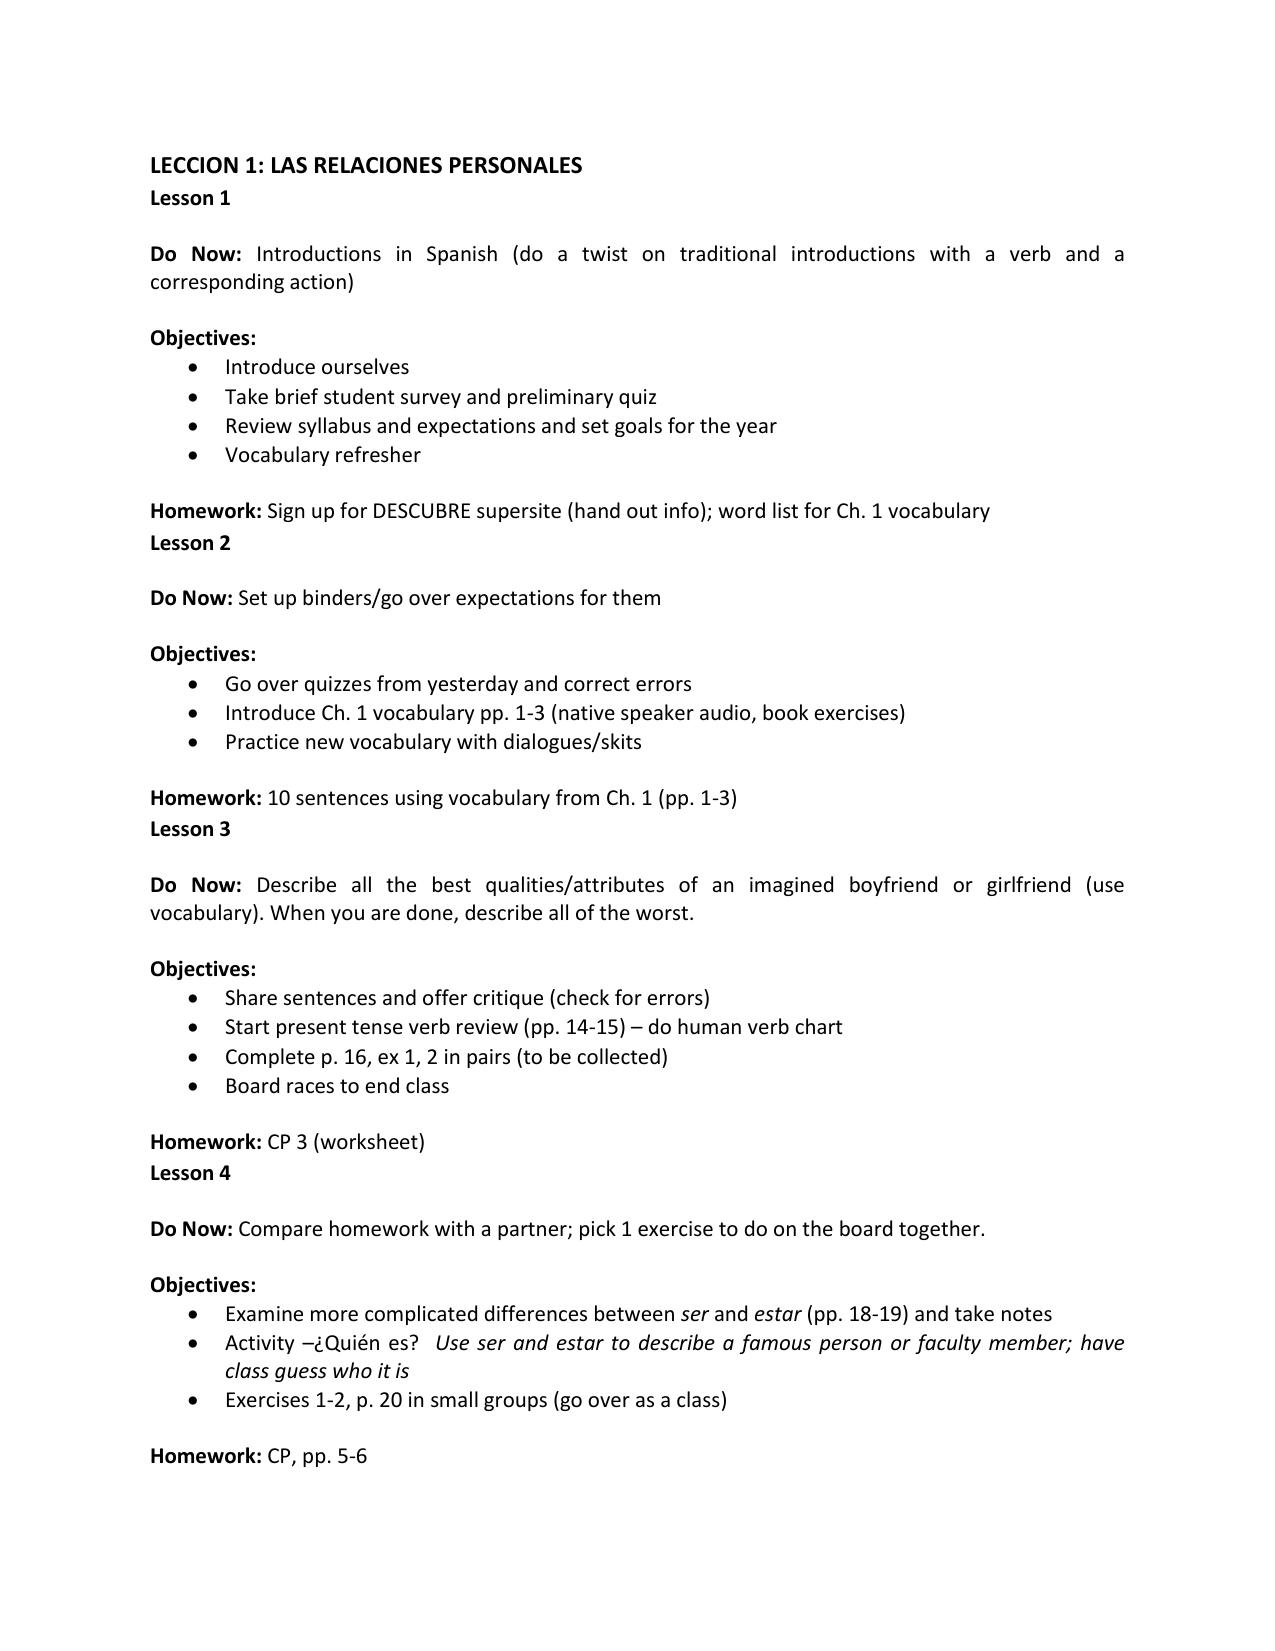 Worksheet Ser Vs Estar Worksheet Carlos Lomas Worksheet For Everyone